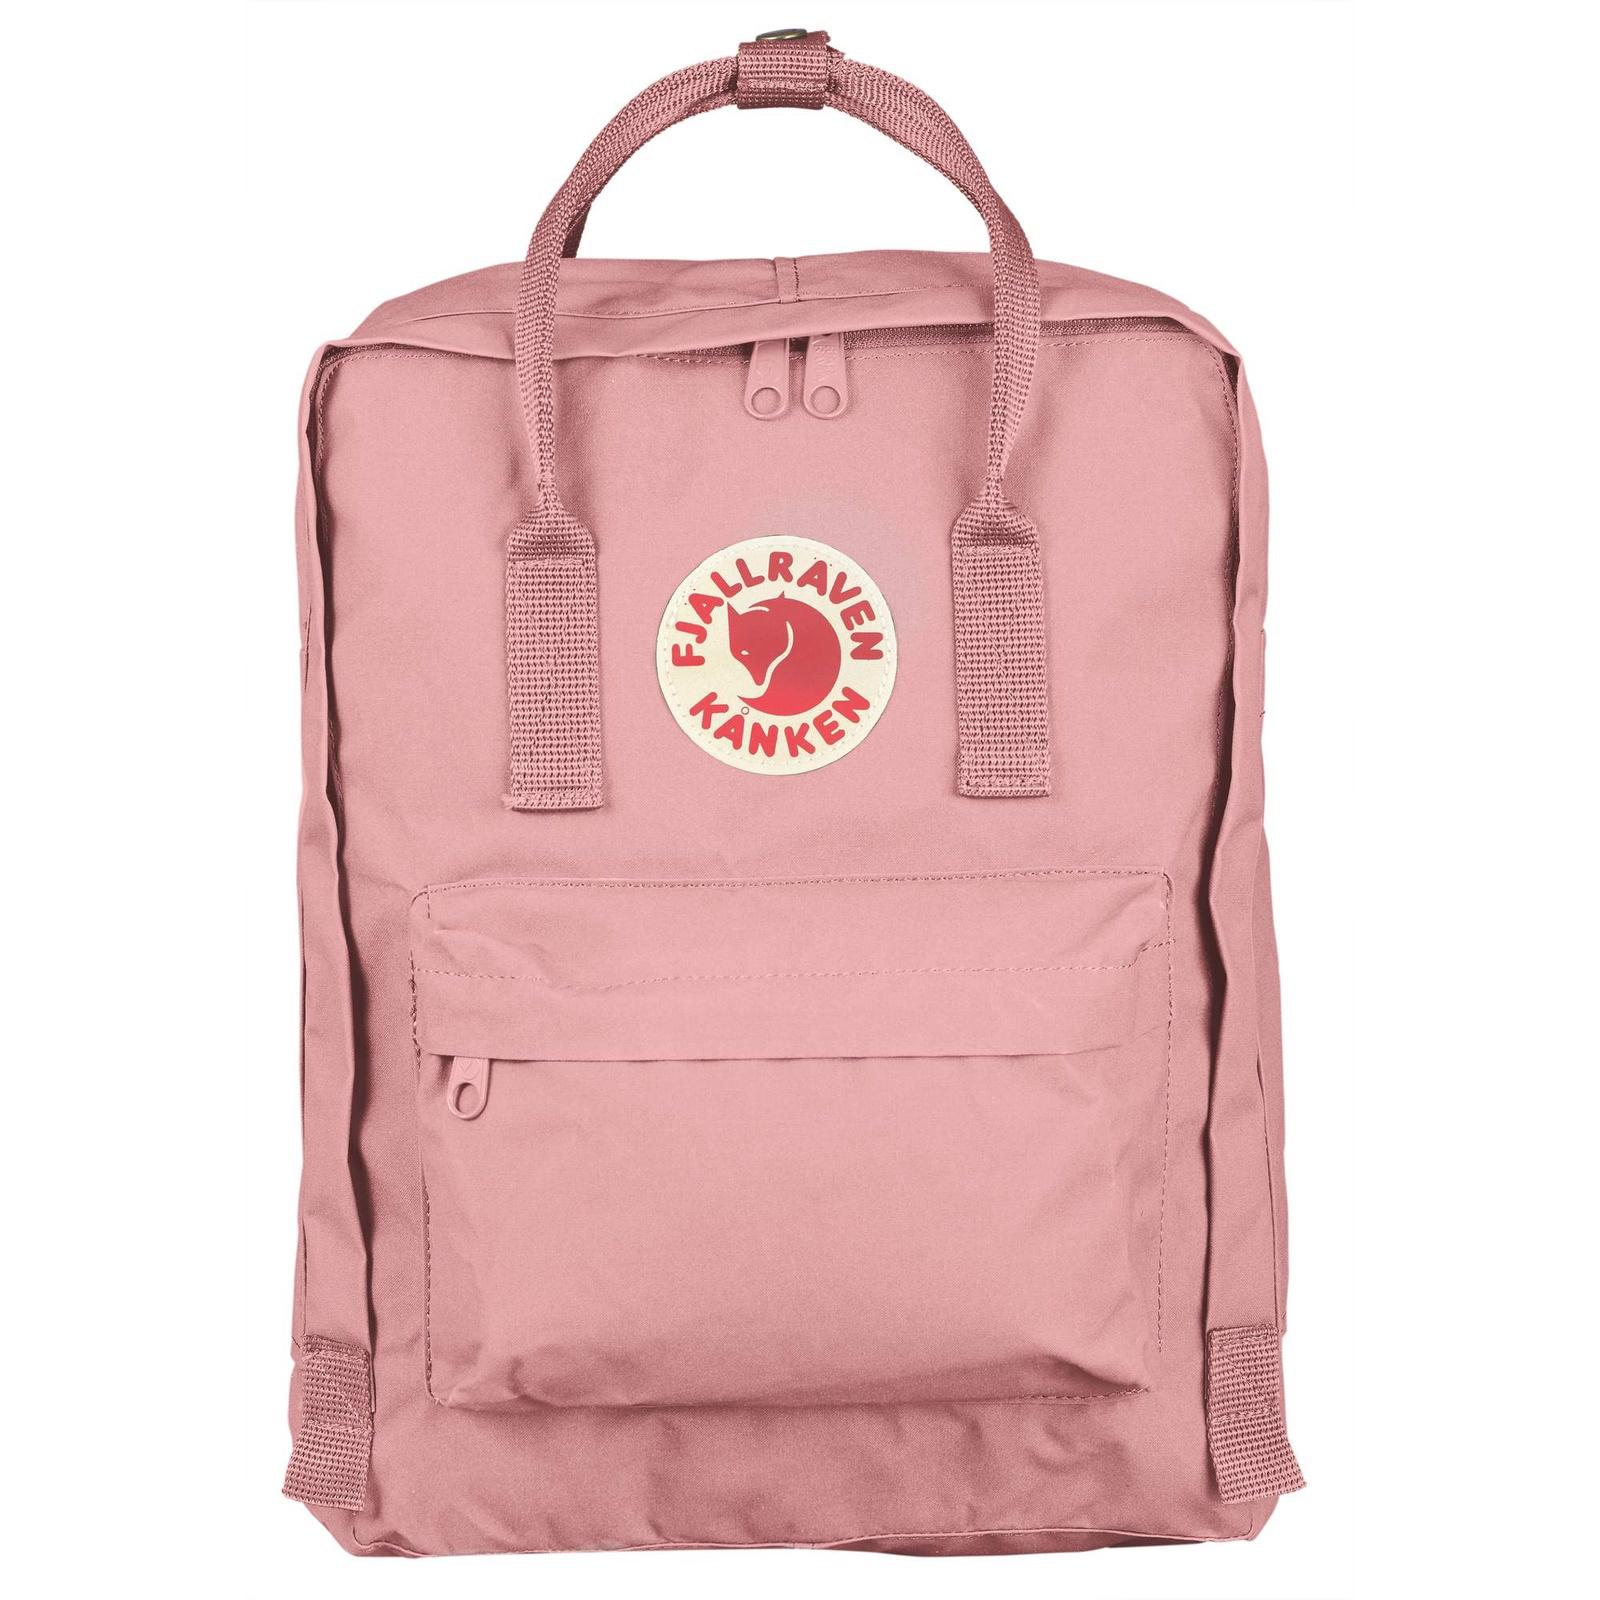 Рюкзак Fjallraven Kanken 312, розовый цена и фото